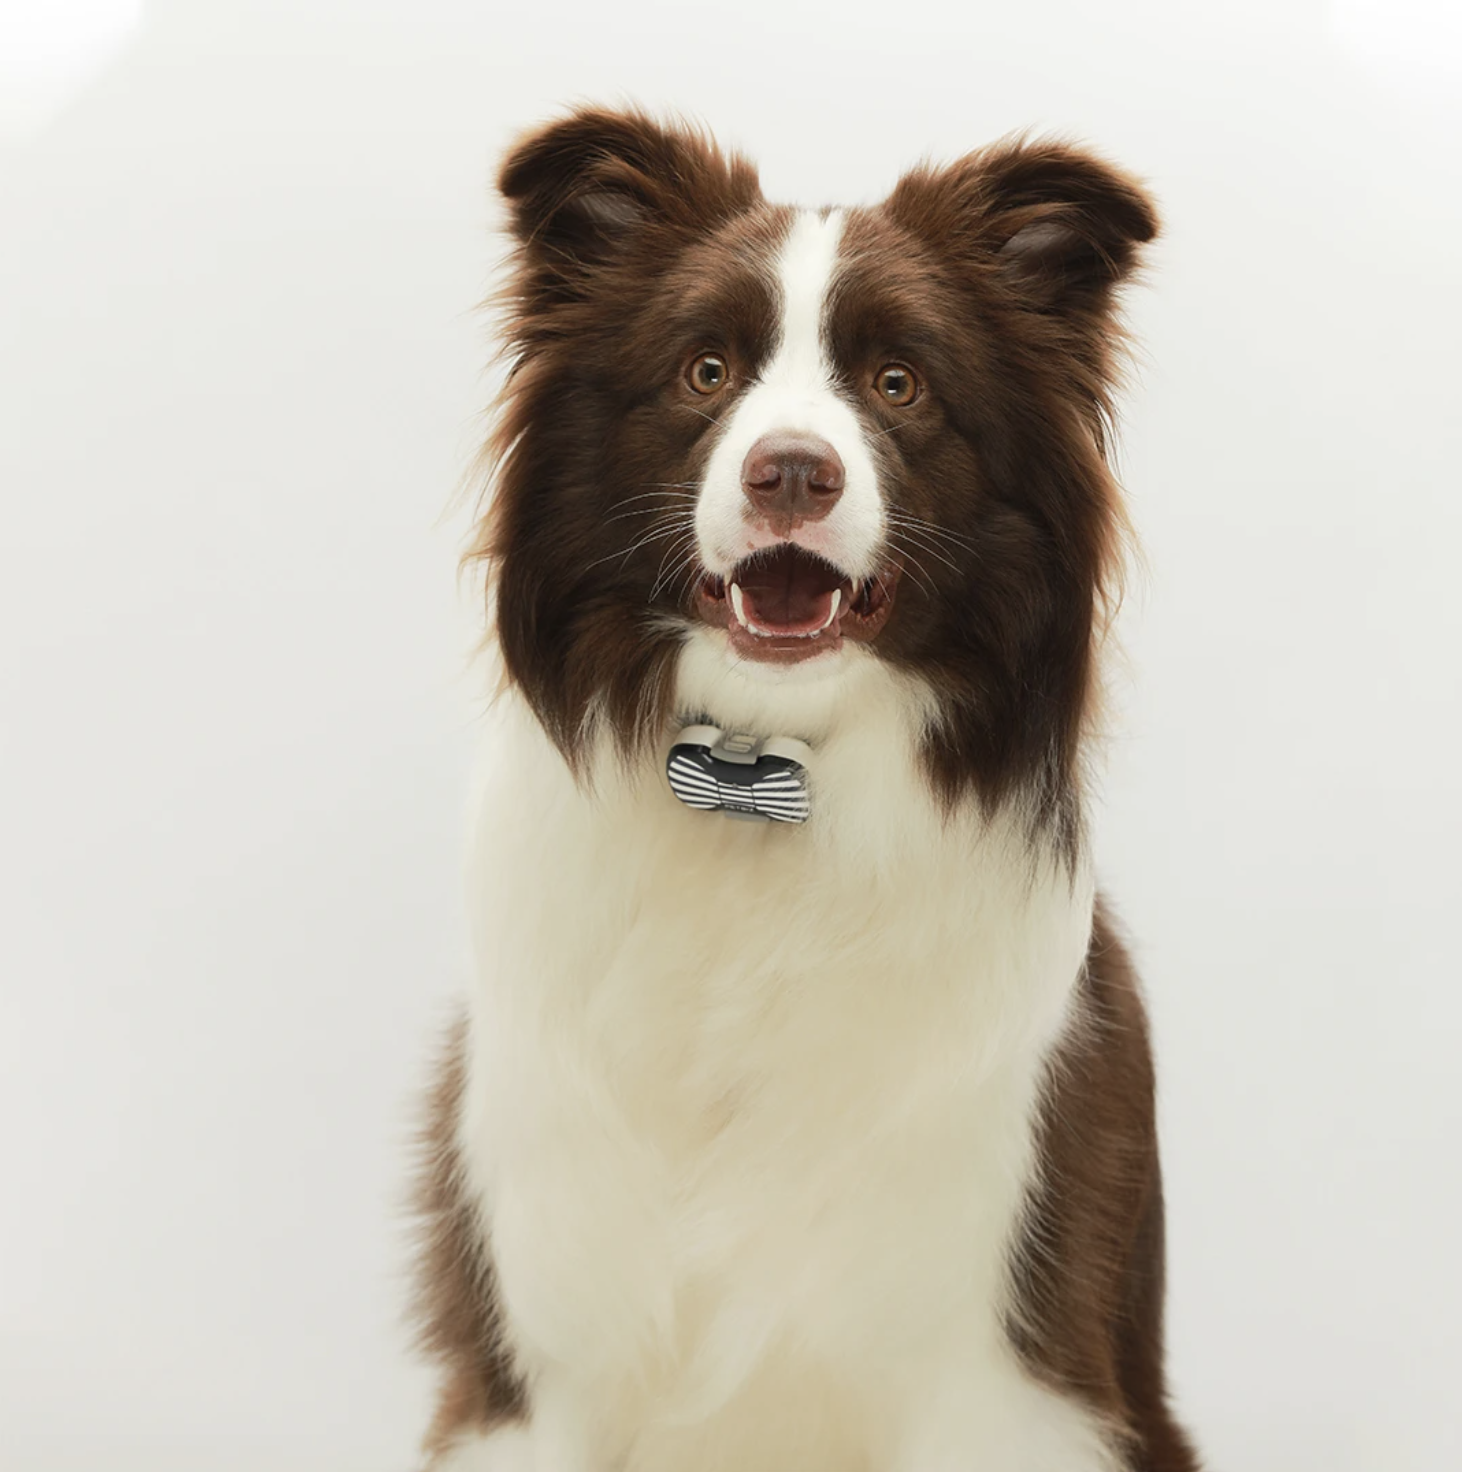 dog wearing petbiz tracker on his collarte background